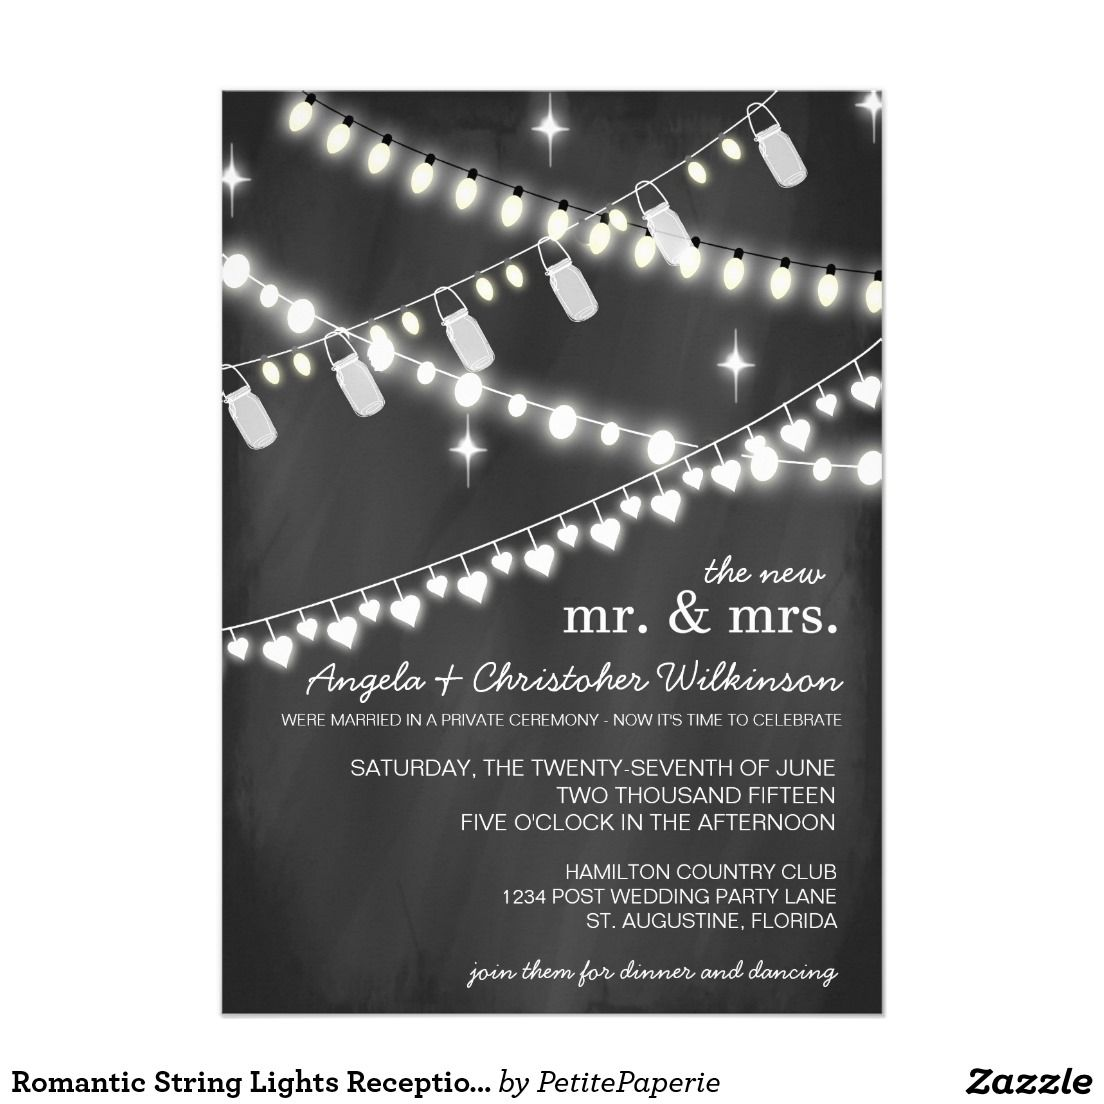 reception only wedding invitations Romantic String Lights Reception Only Invitation